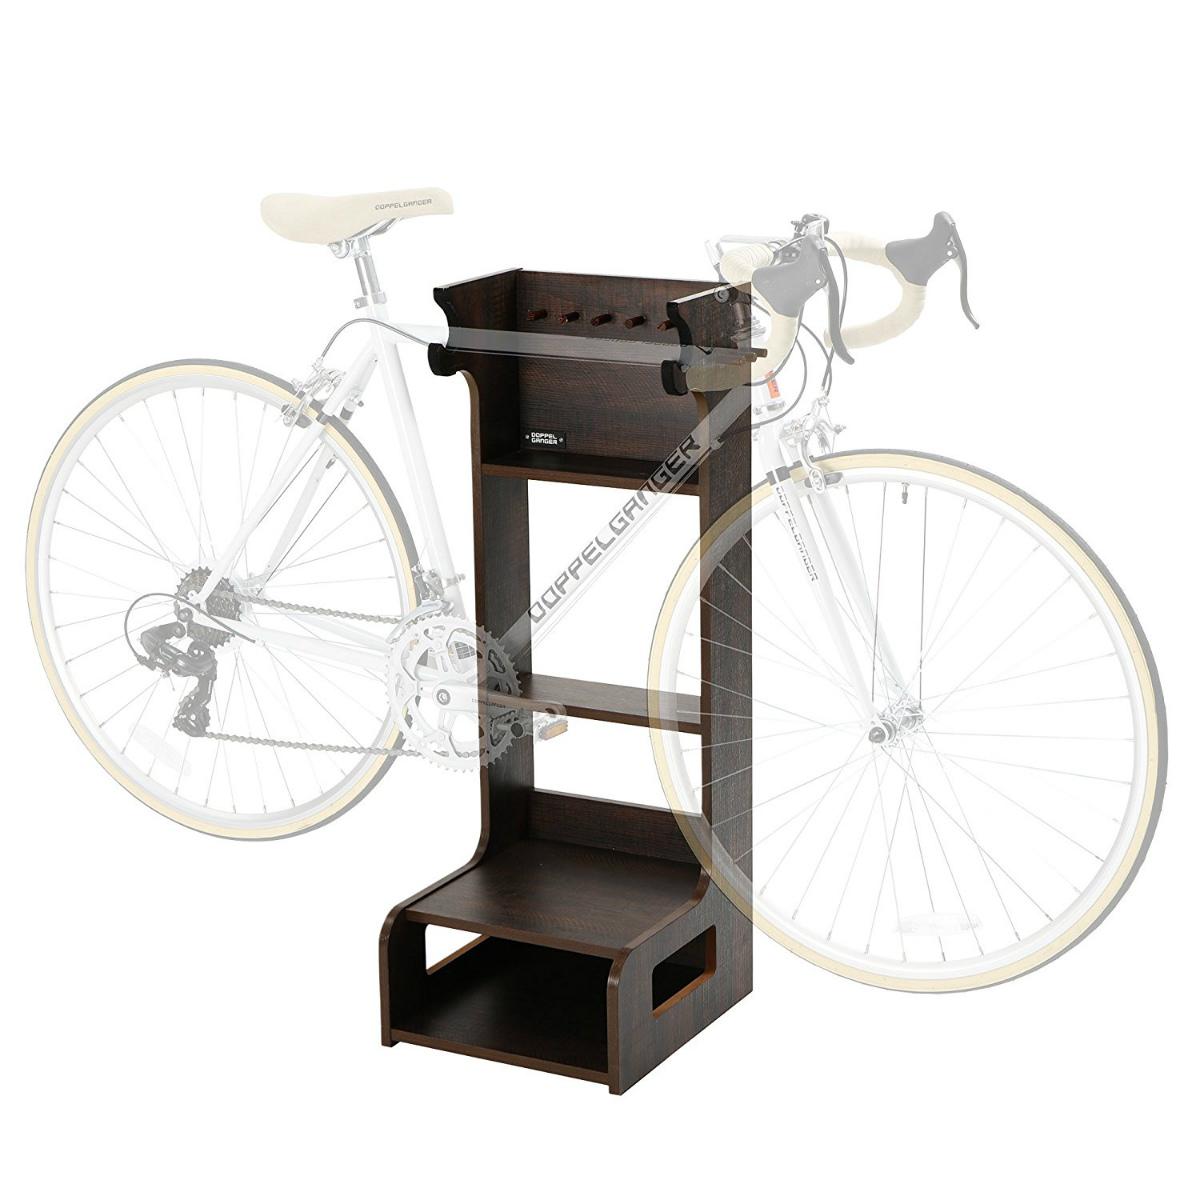 DOPPELGANGER バイシクルレスト シェルフタイプ DDS465-BR | 耐荷重20kg | 自転車家具 ディスプレイ スタンド | ドッペルギャンガー